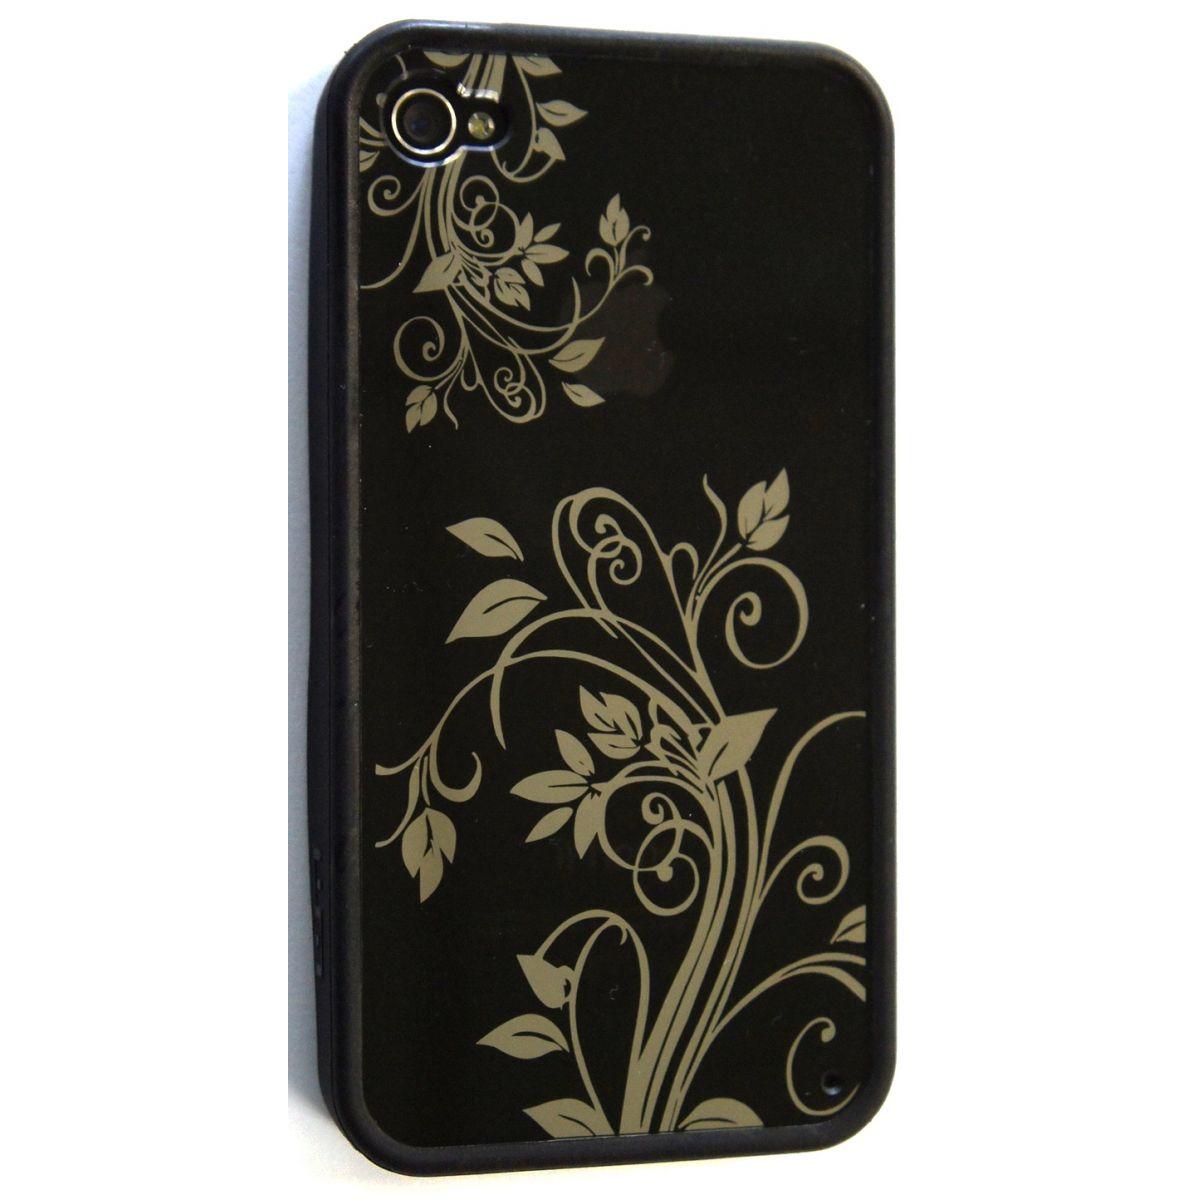 PACK Compre 7 Capas Pague 3 - Capa iphone 4 / 4S Floral